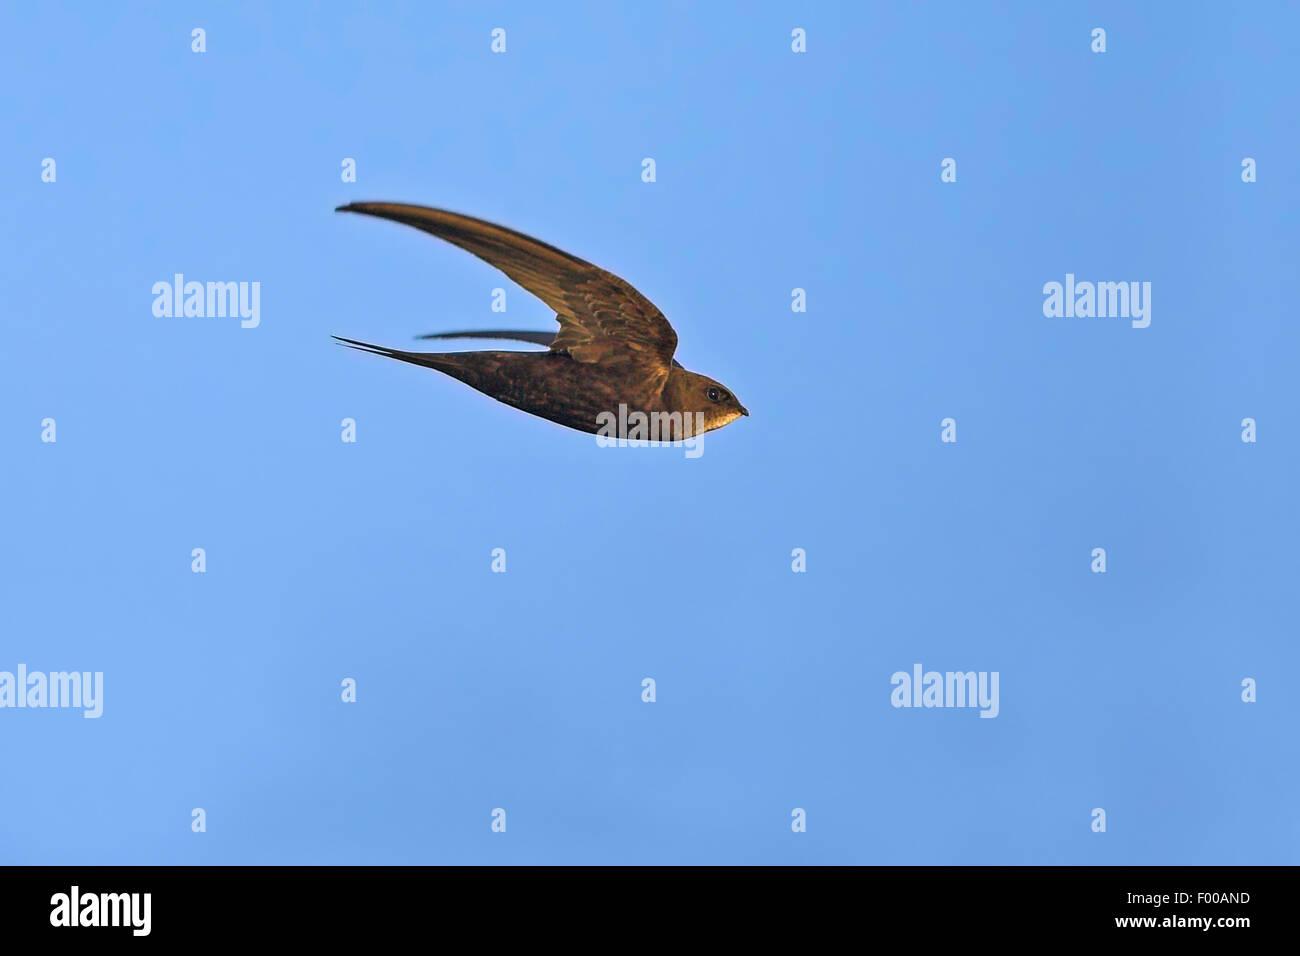 Eurasian swift (Apus apus), in volo, vista laterale, GERMANIA Baden-Wuerttemberg Immagini Stock